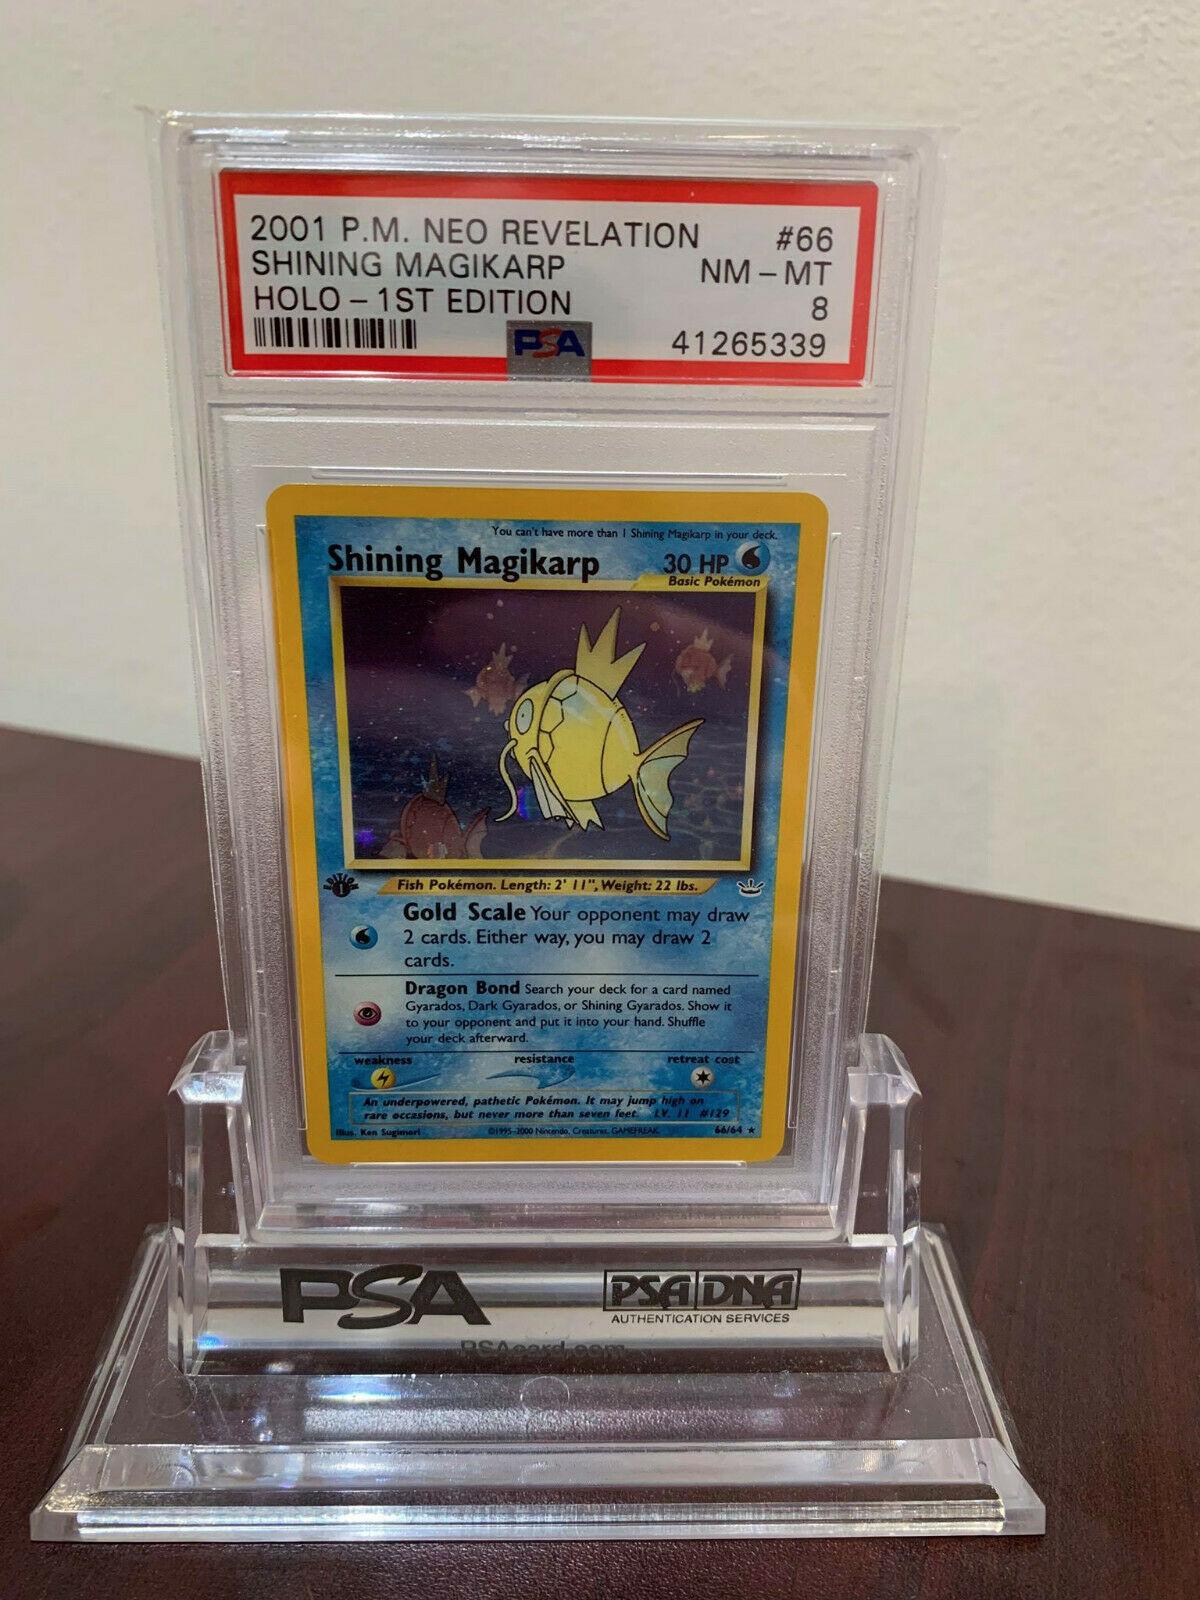 PSA 8 Secret Holo 1st Edition Shining Magikarp Neo Revelation Pokemon Card 6664